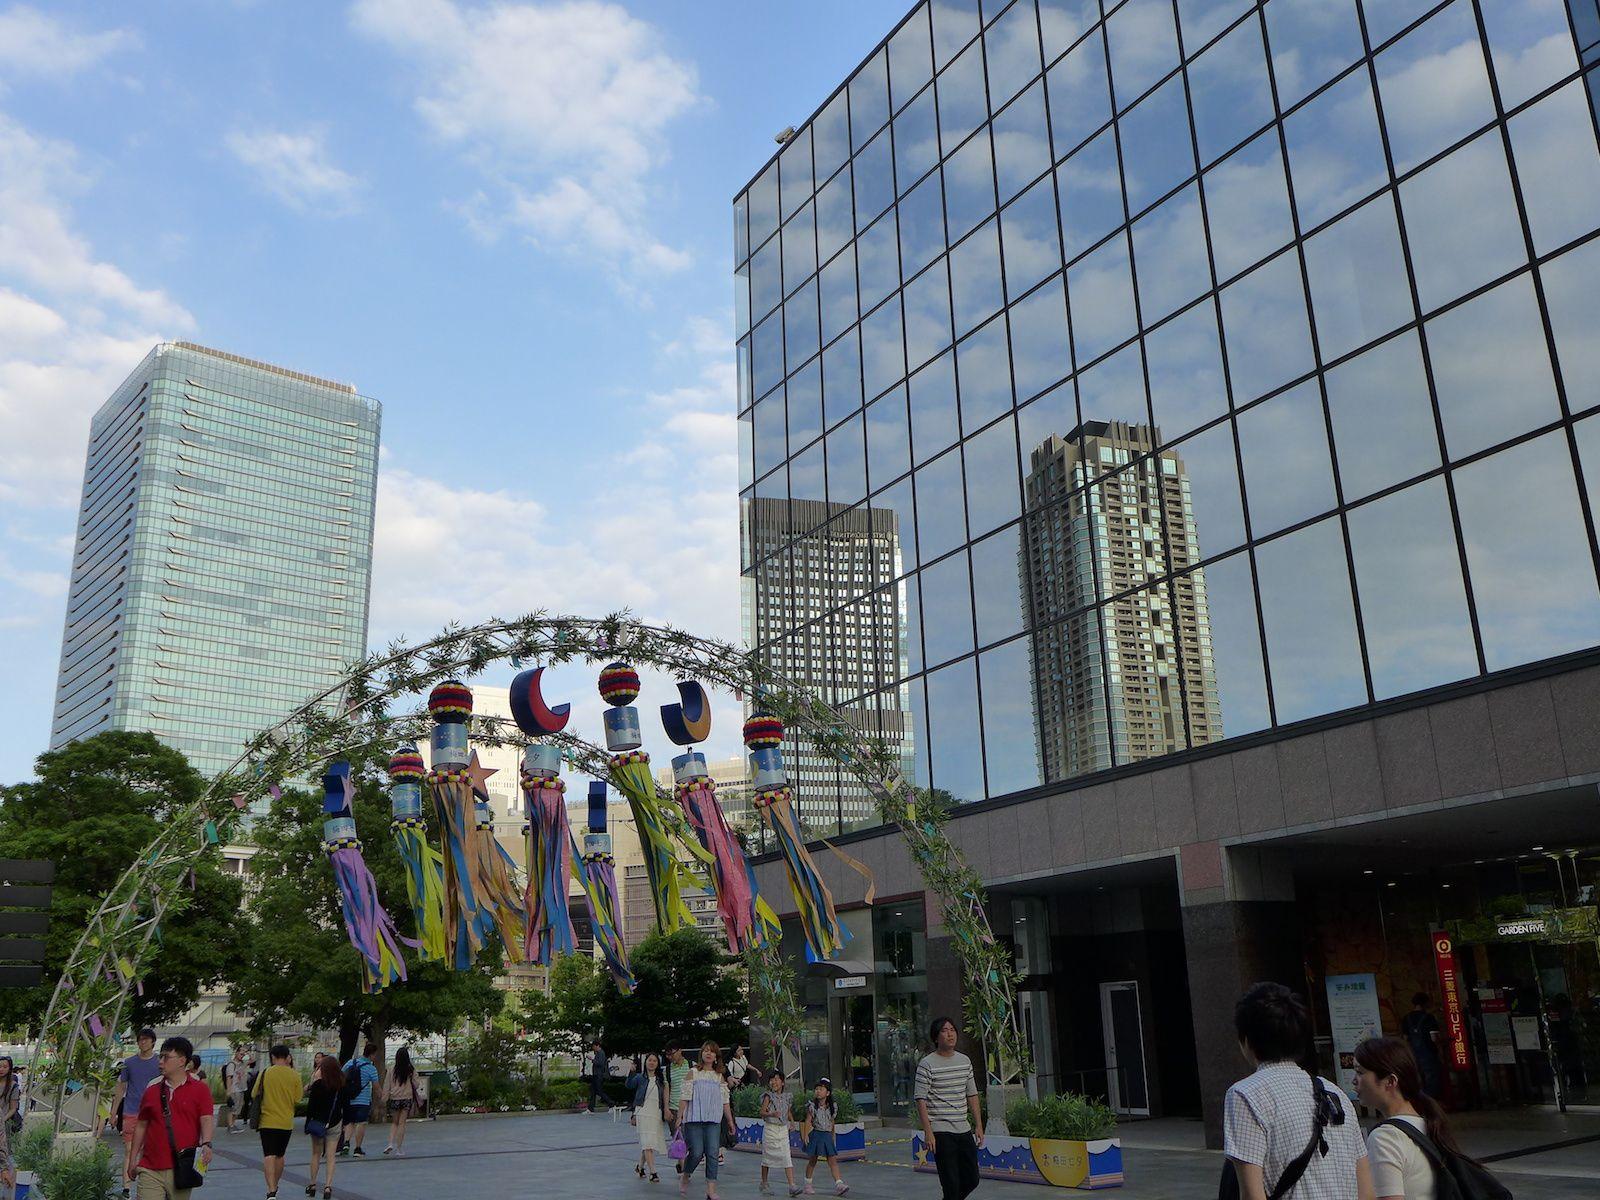 Osaka l'aquarium et Sky tower garden